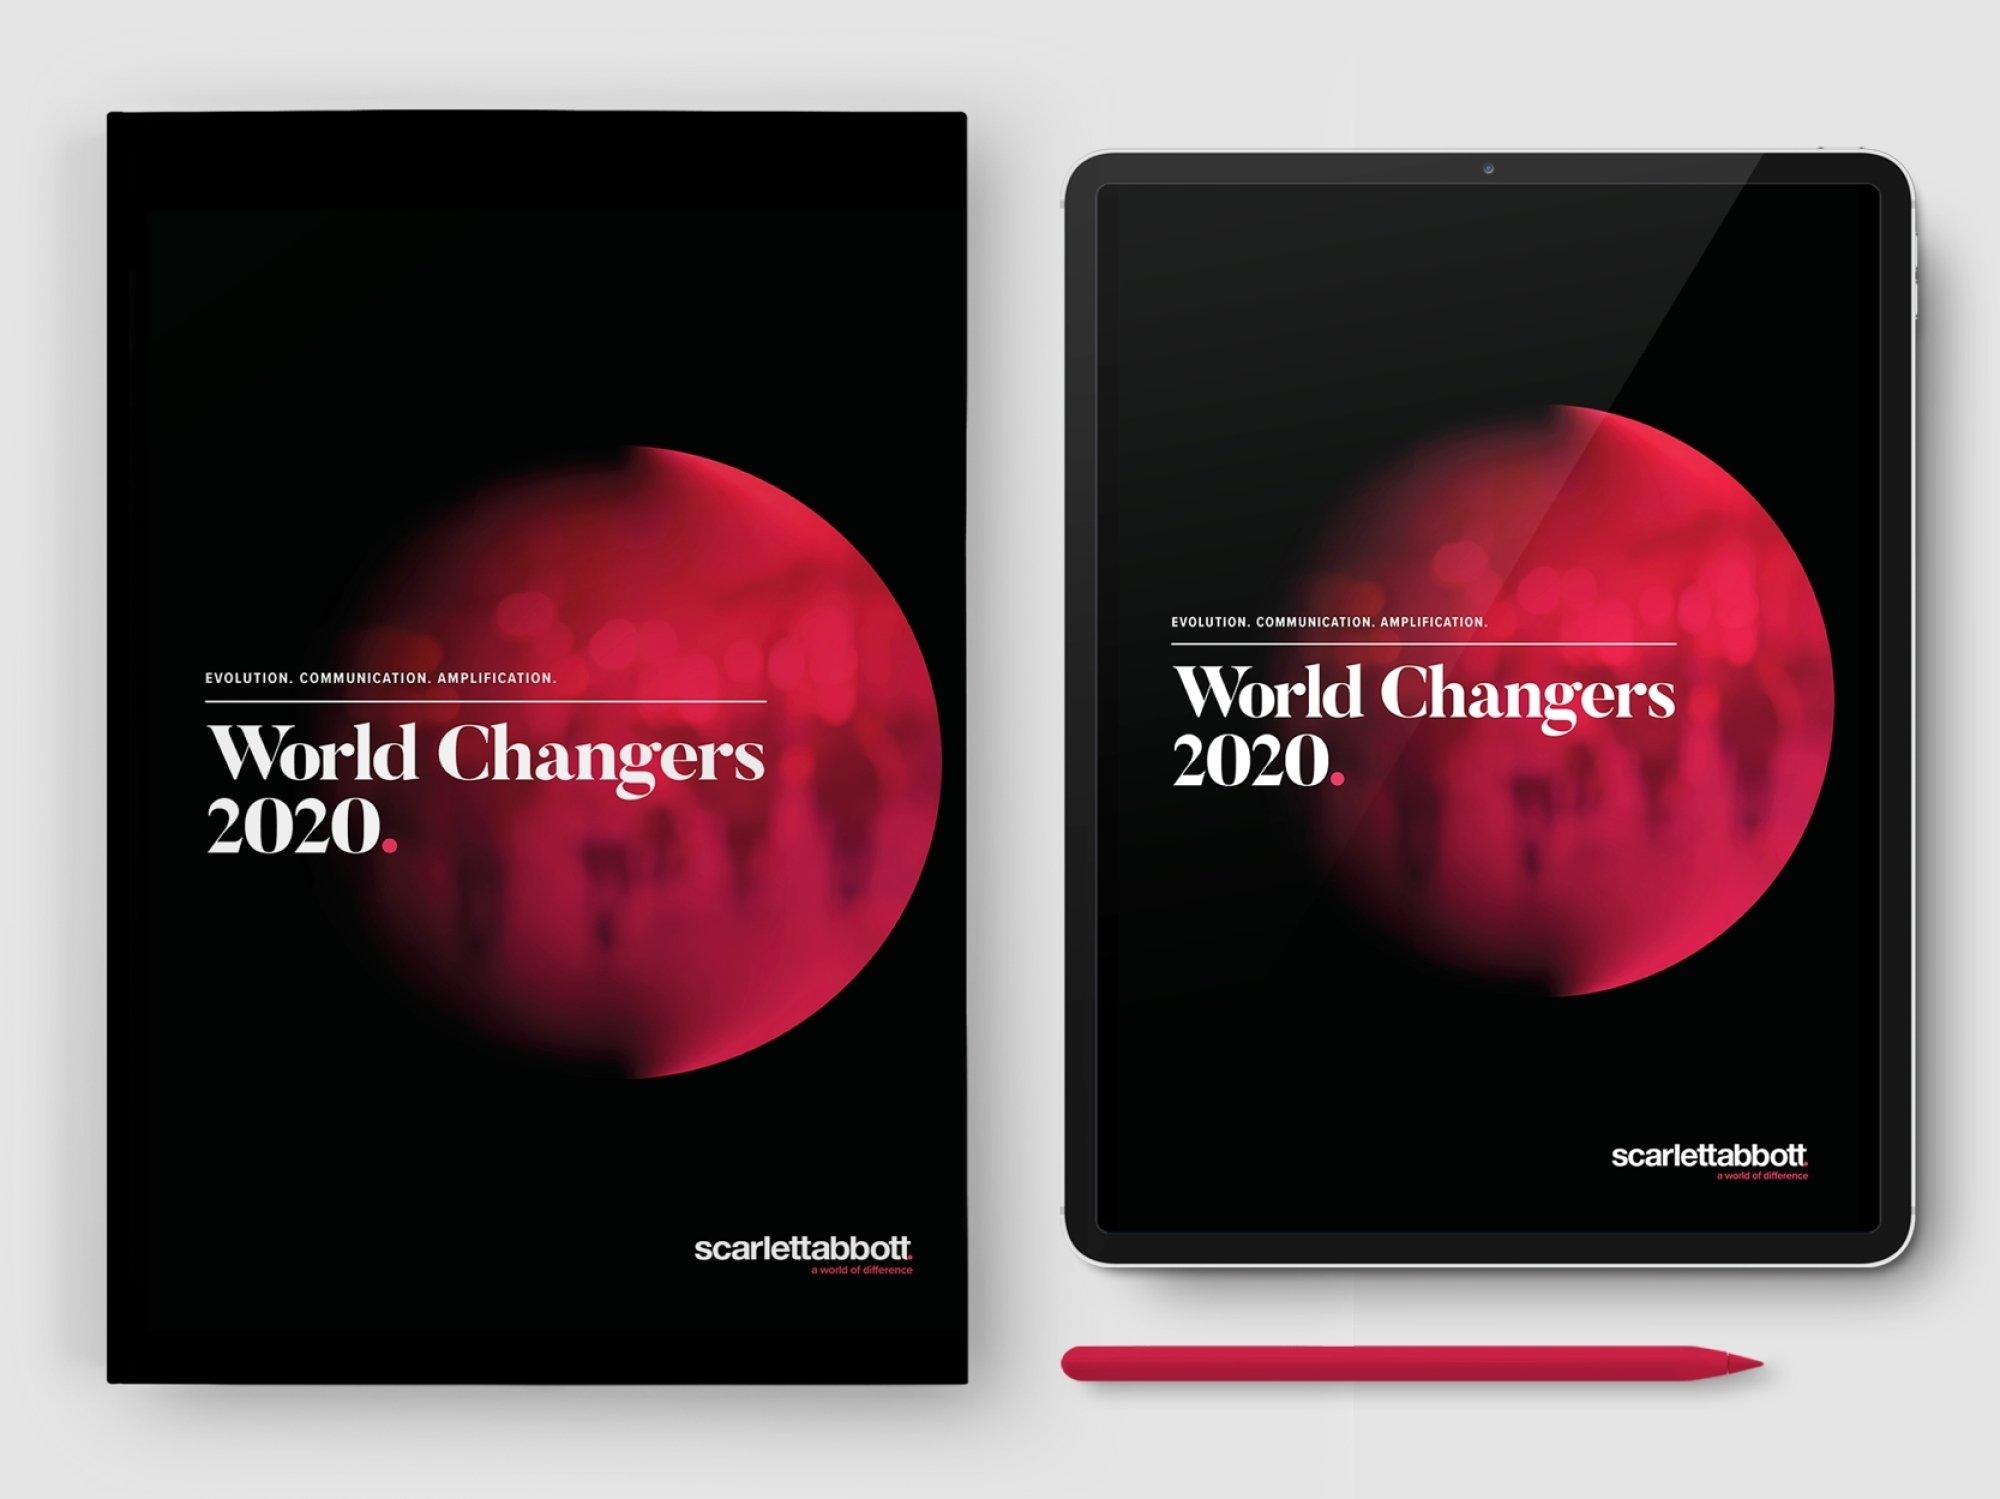 2020 World Changers Report